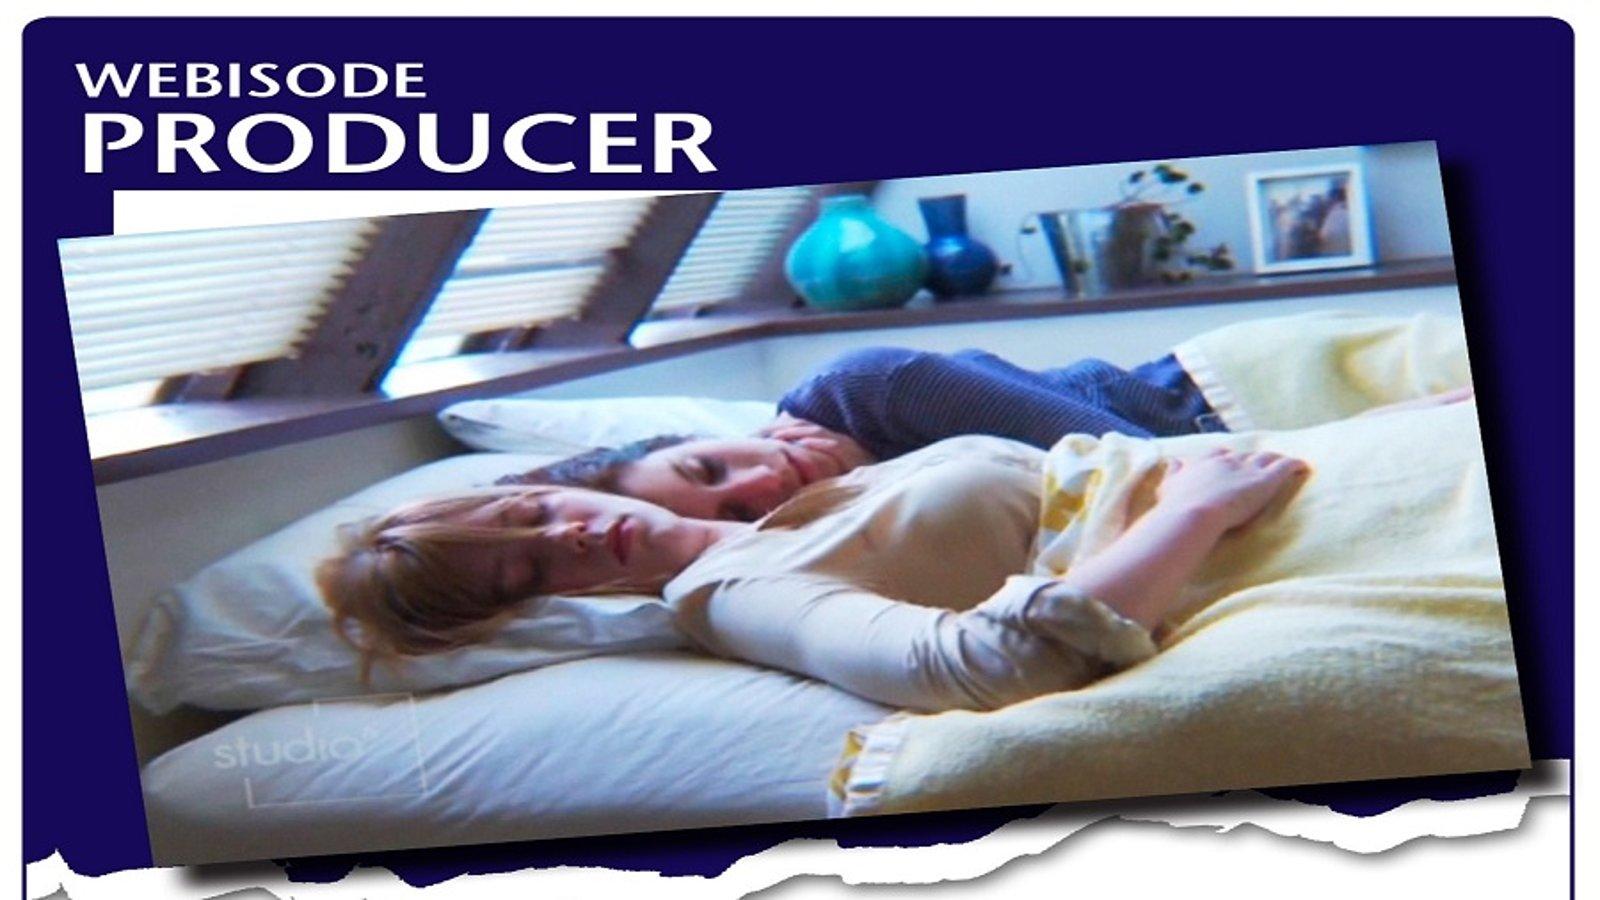 Webisode Producer: Producer & Director Otessa Ghadar